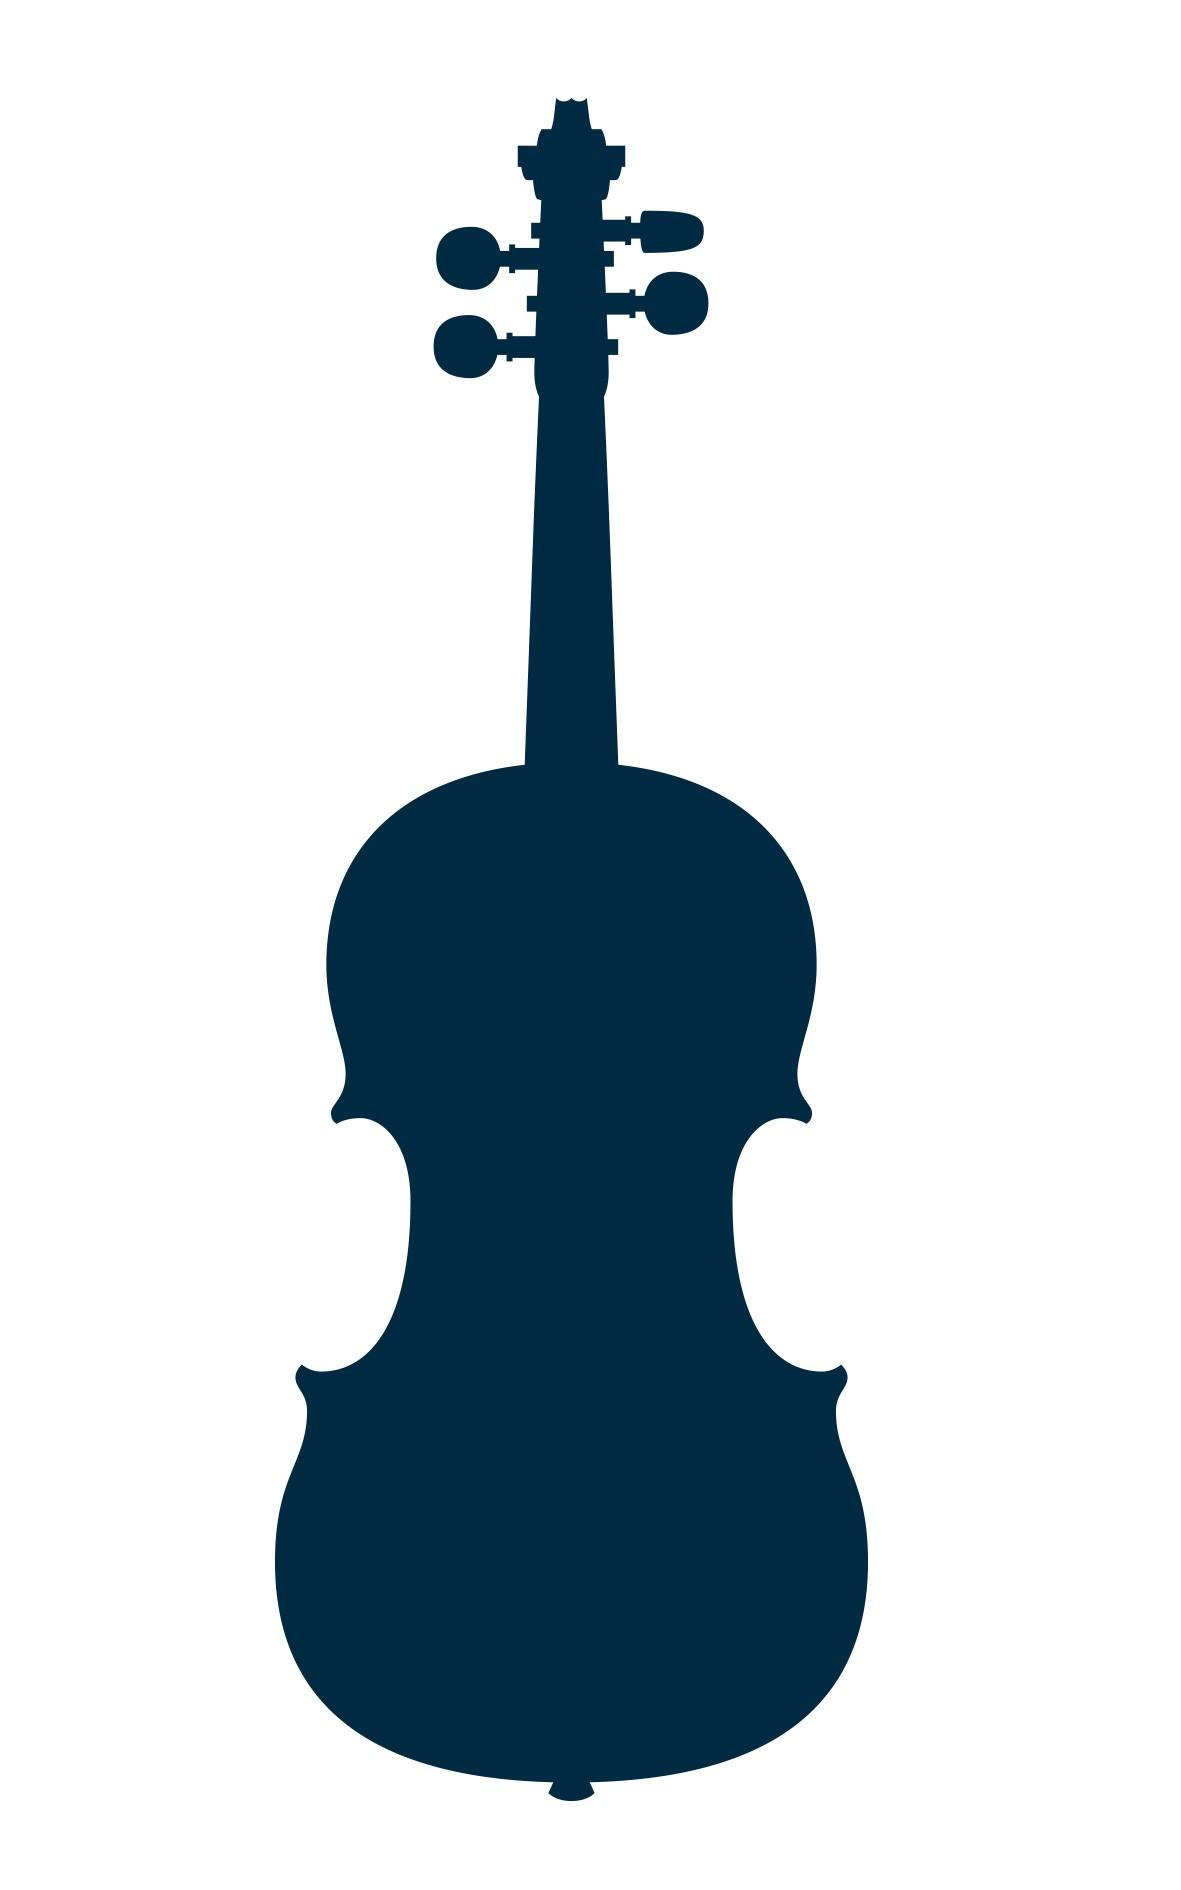 Fine Klingenthal violin, Friedrich August Glass